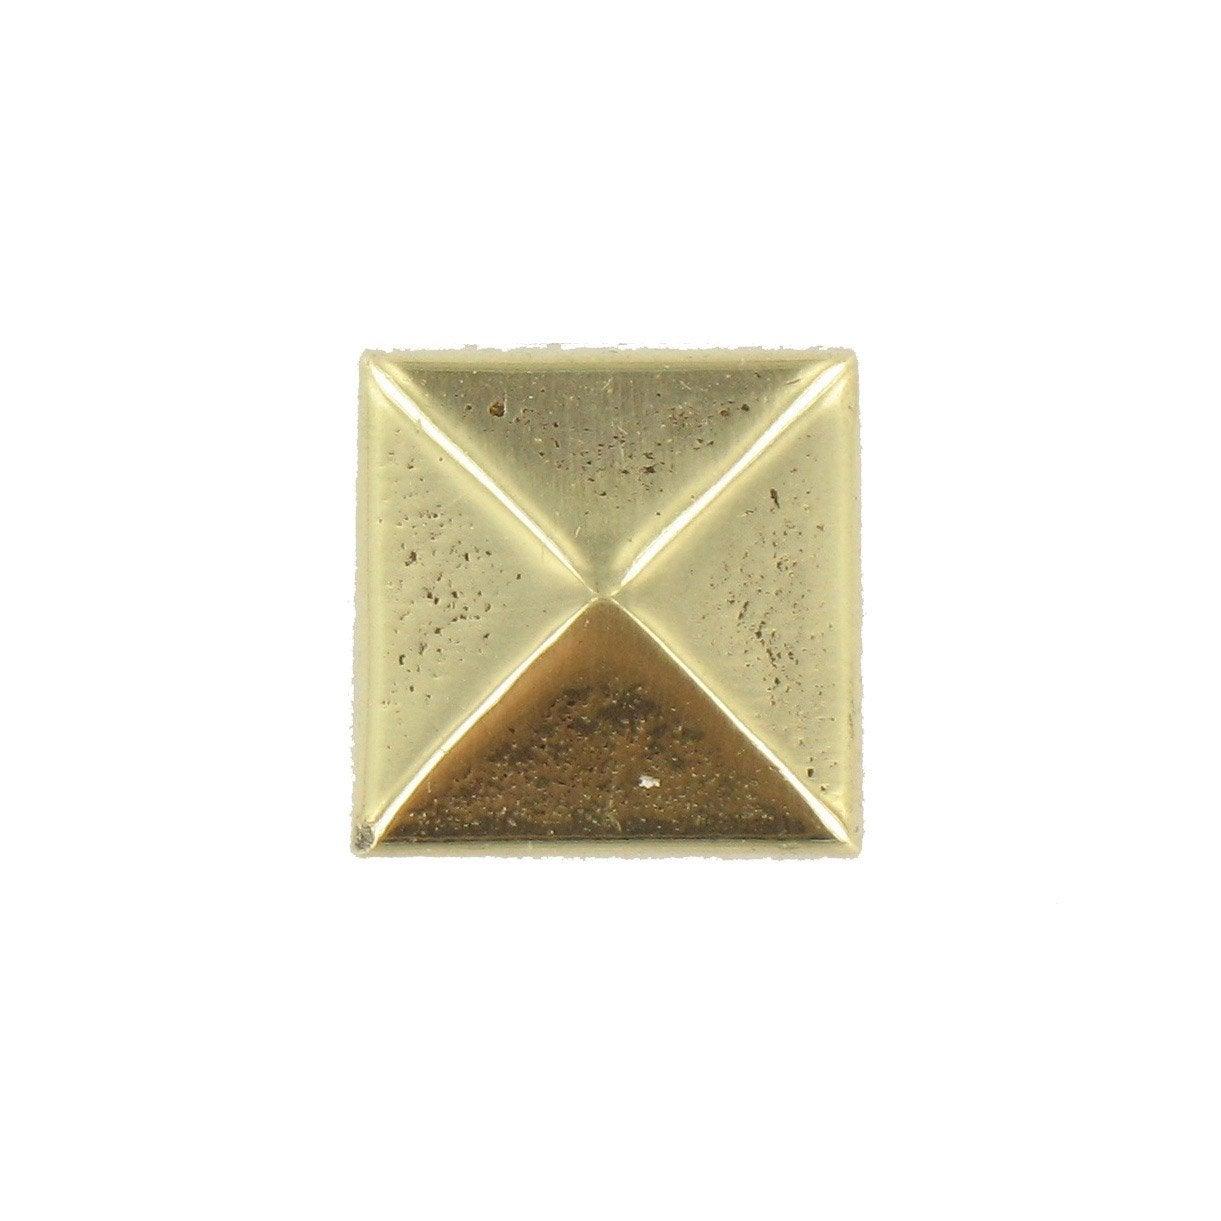 clou pointe de diamant en laiton poli leroy merlin. Black Bedroom Furniture Sets. Home Design Ideas